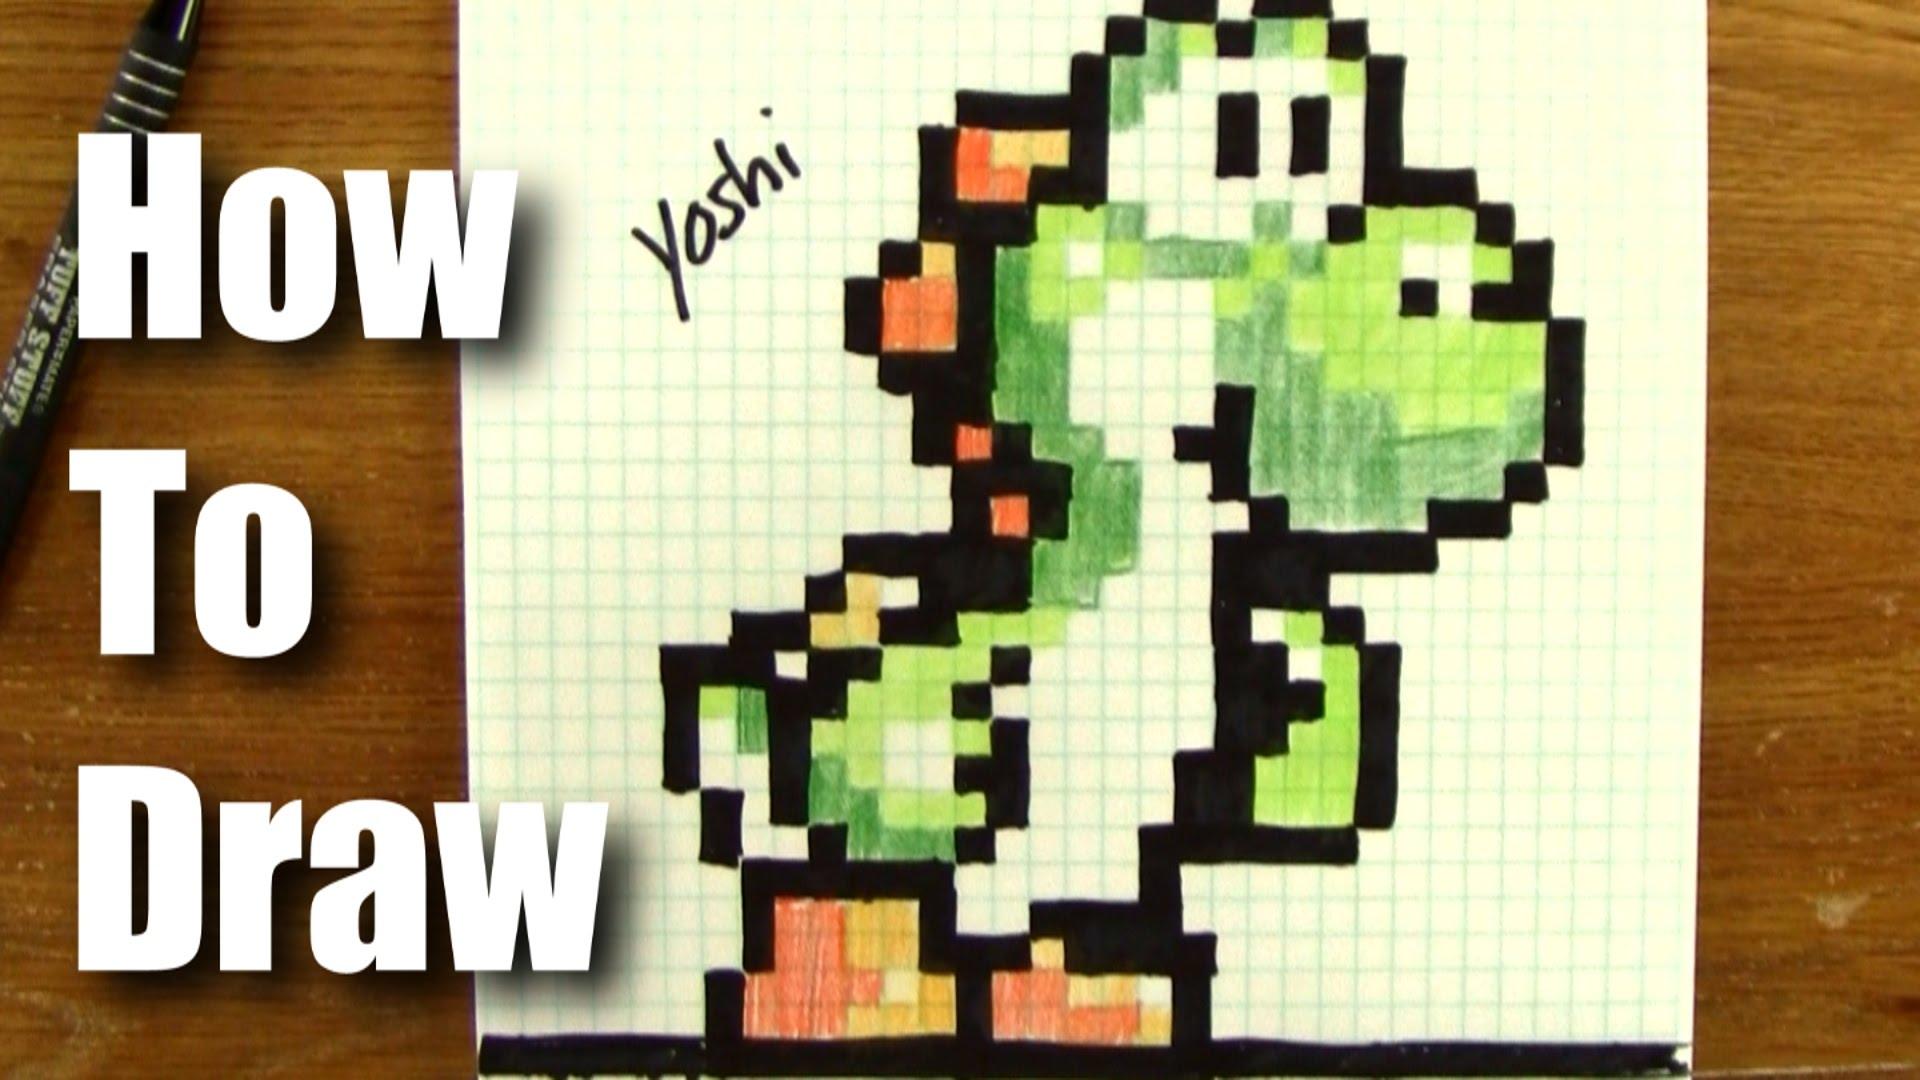 1920x1080 How To Draw Pixel Art Yoshi From Mario!